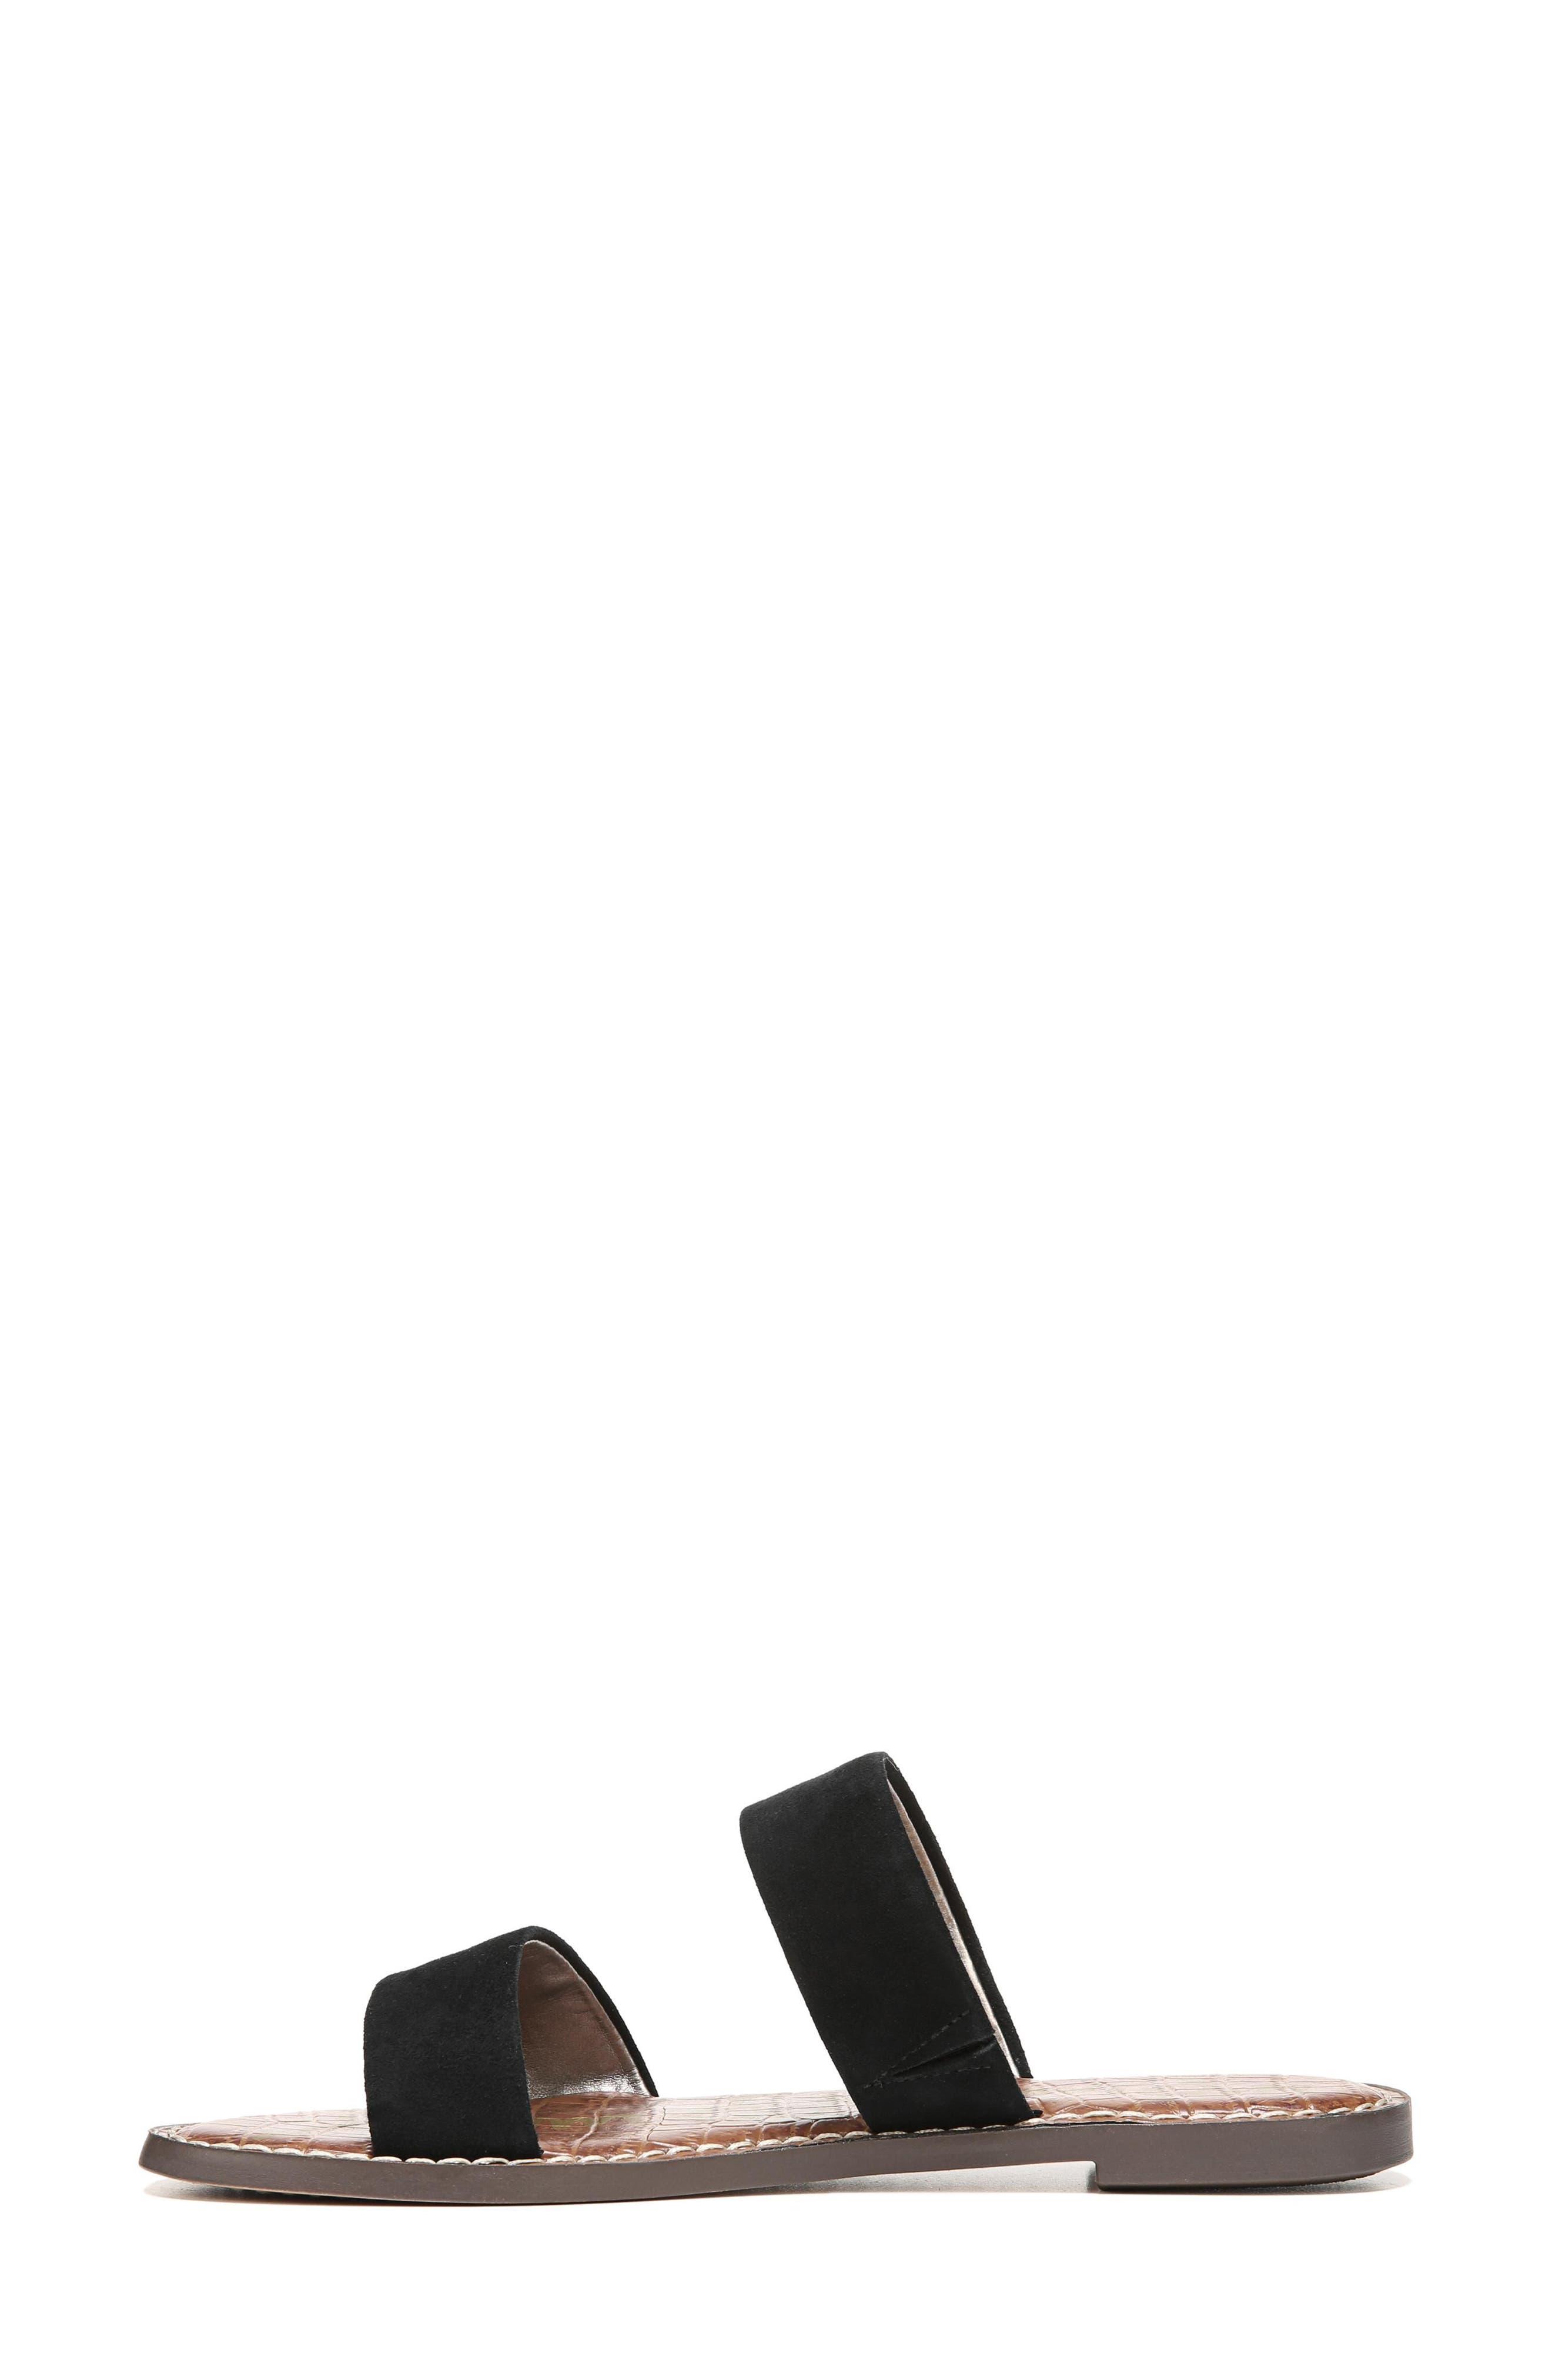 Gala Two Strap Slide Sandal,                             Alternate thumbnail 3, color,                             BLACK SUEDE